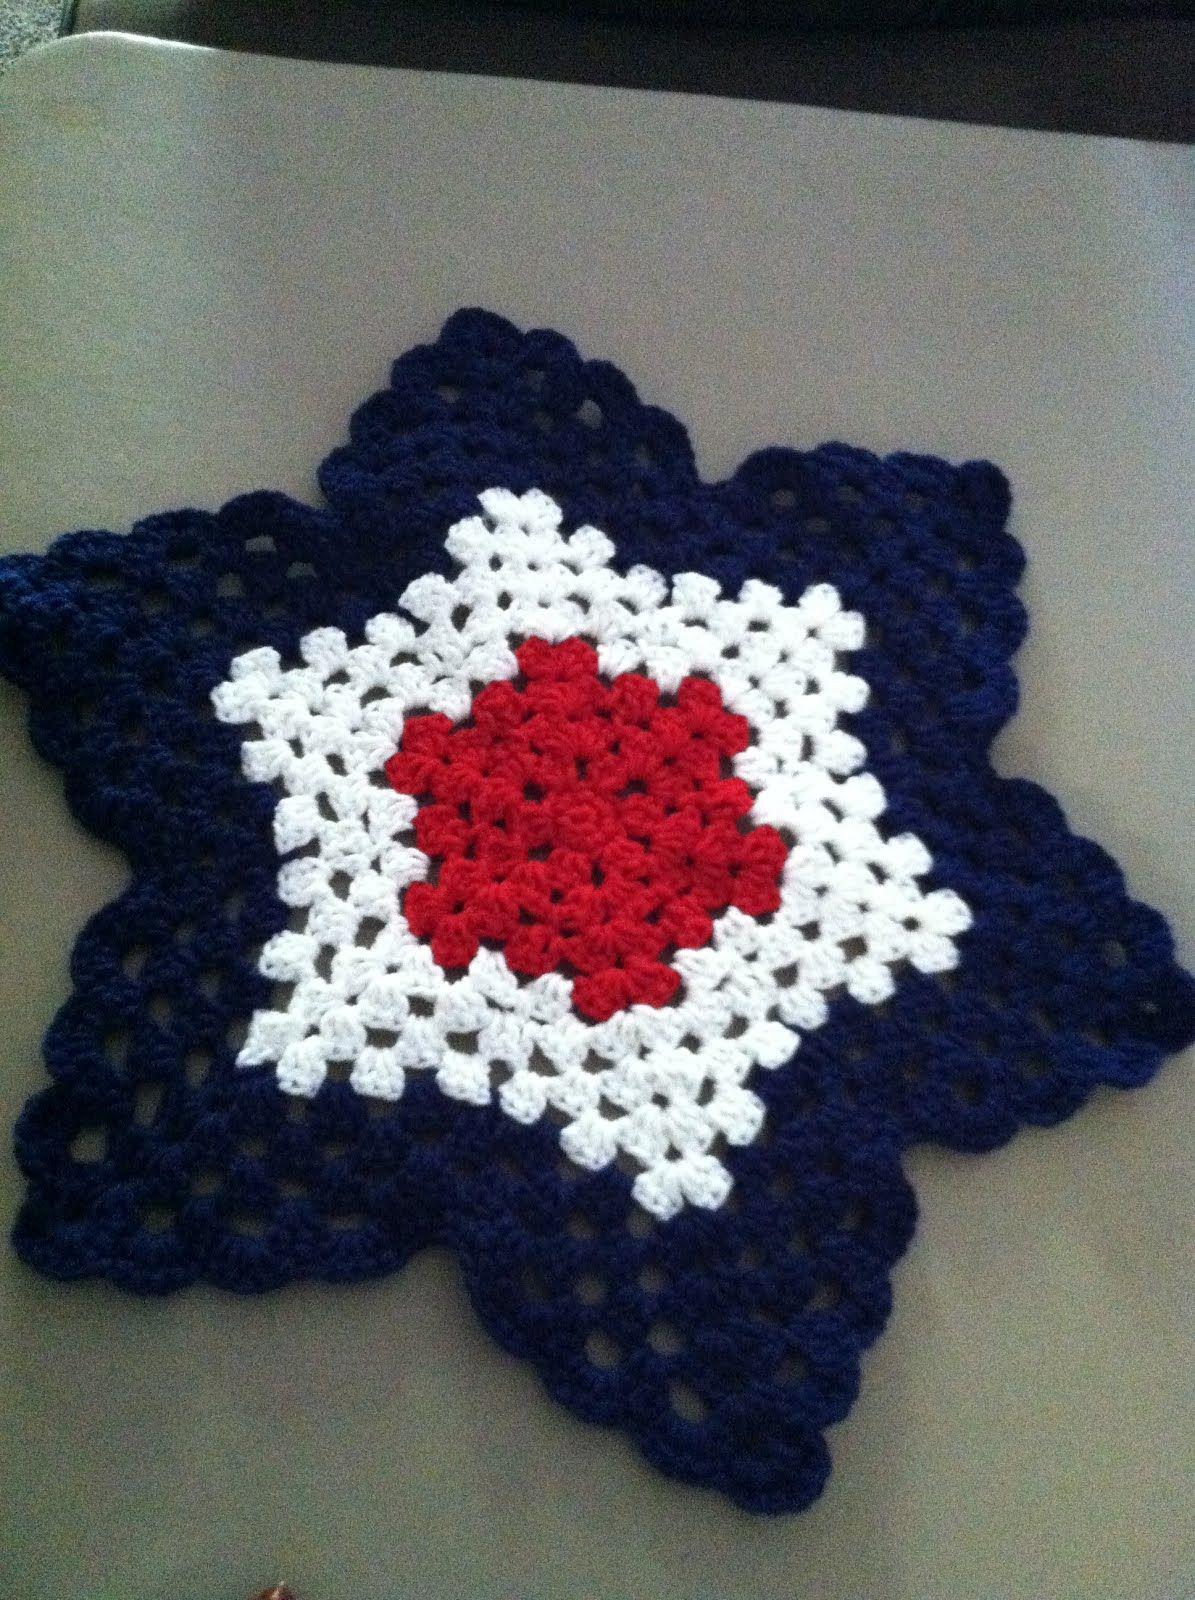 Treasures Made From Yarn: Round Granny Ripple Pattern | Crochet ...